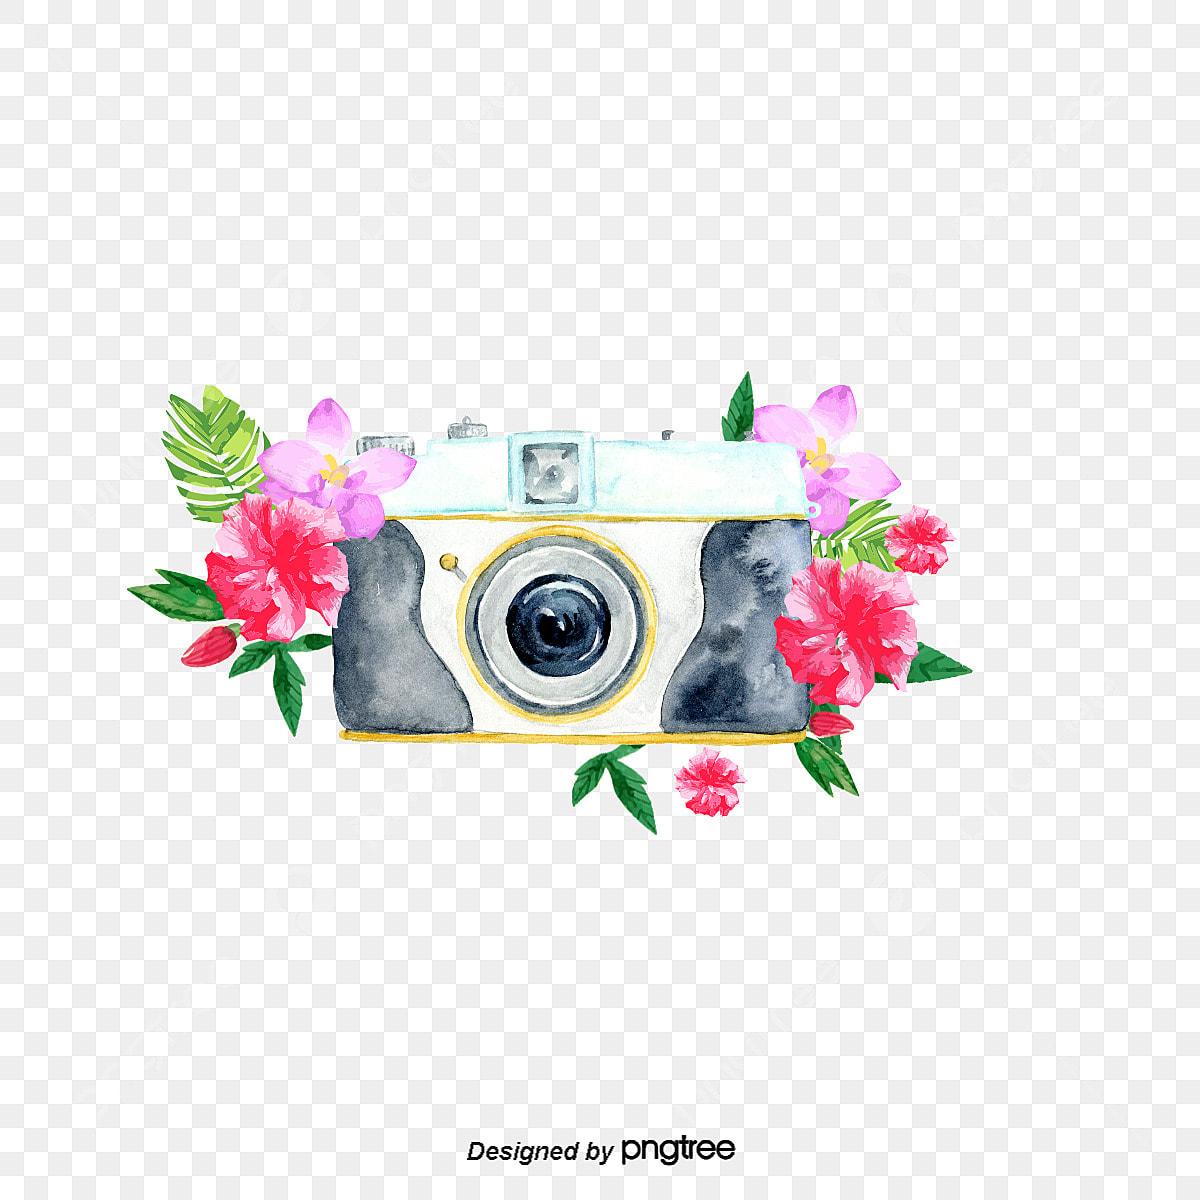 vecteur de fleurs et de cam u00e9ra aquarelle aquarelle fleur de la cam u00e9ra png et vecteur pour